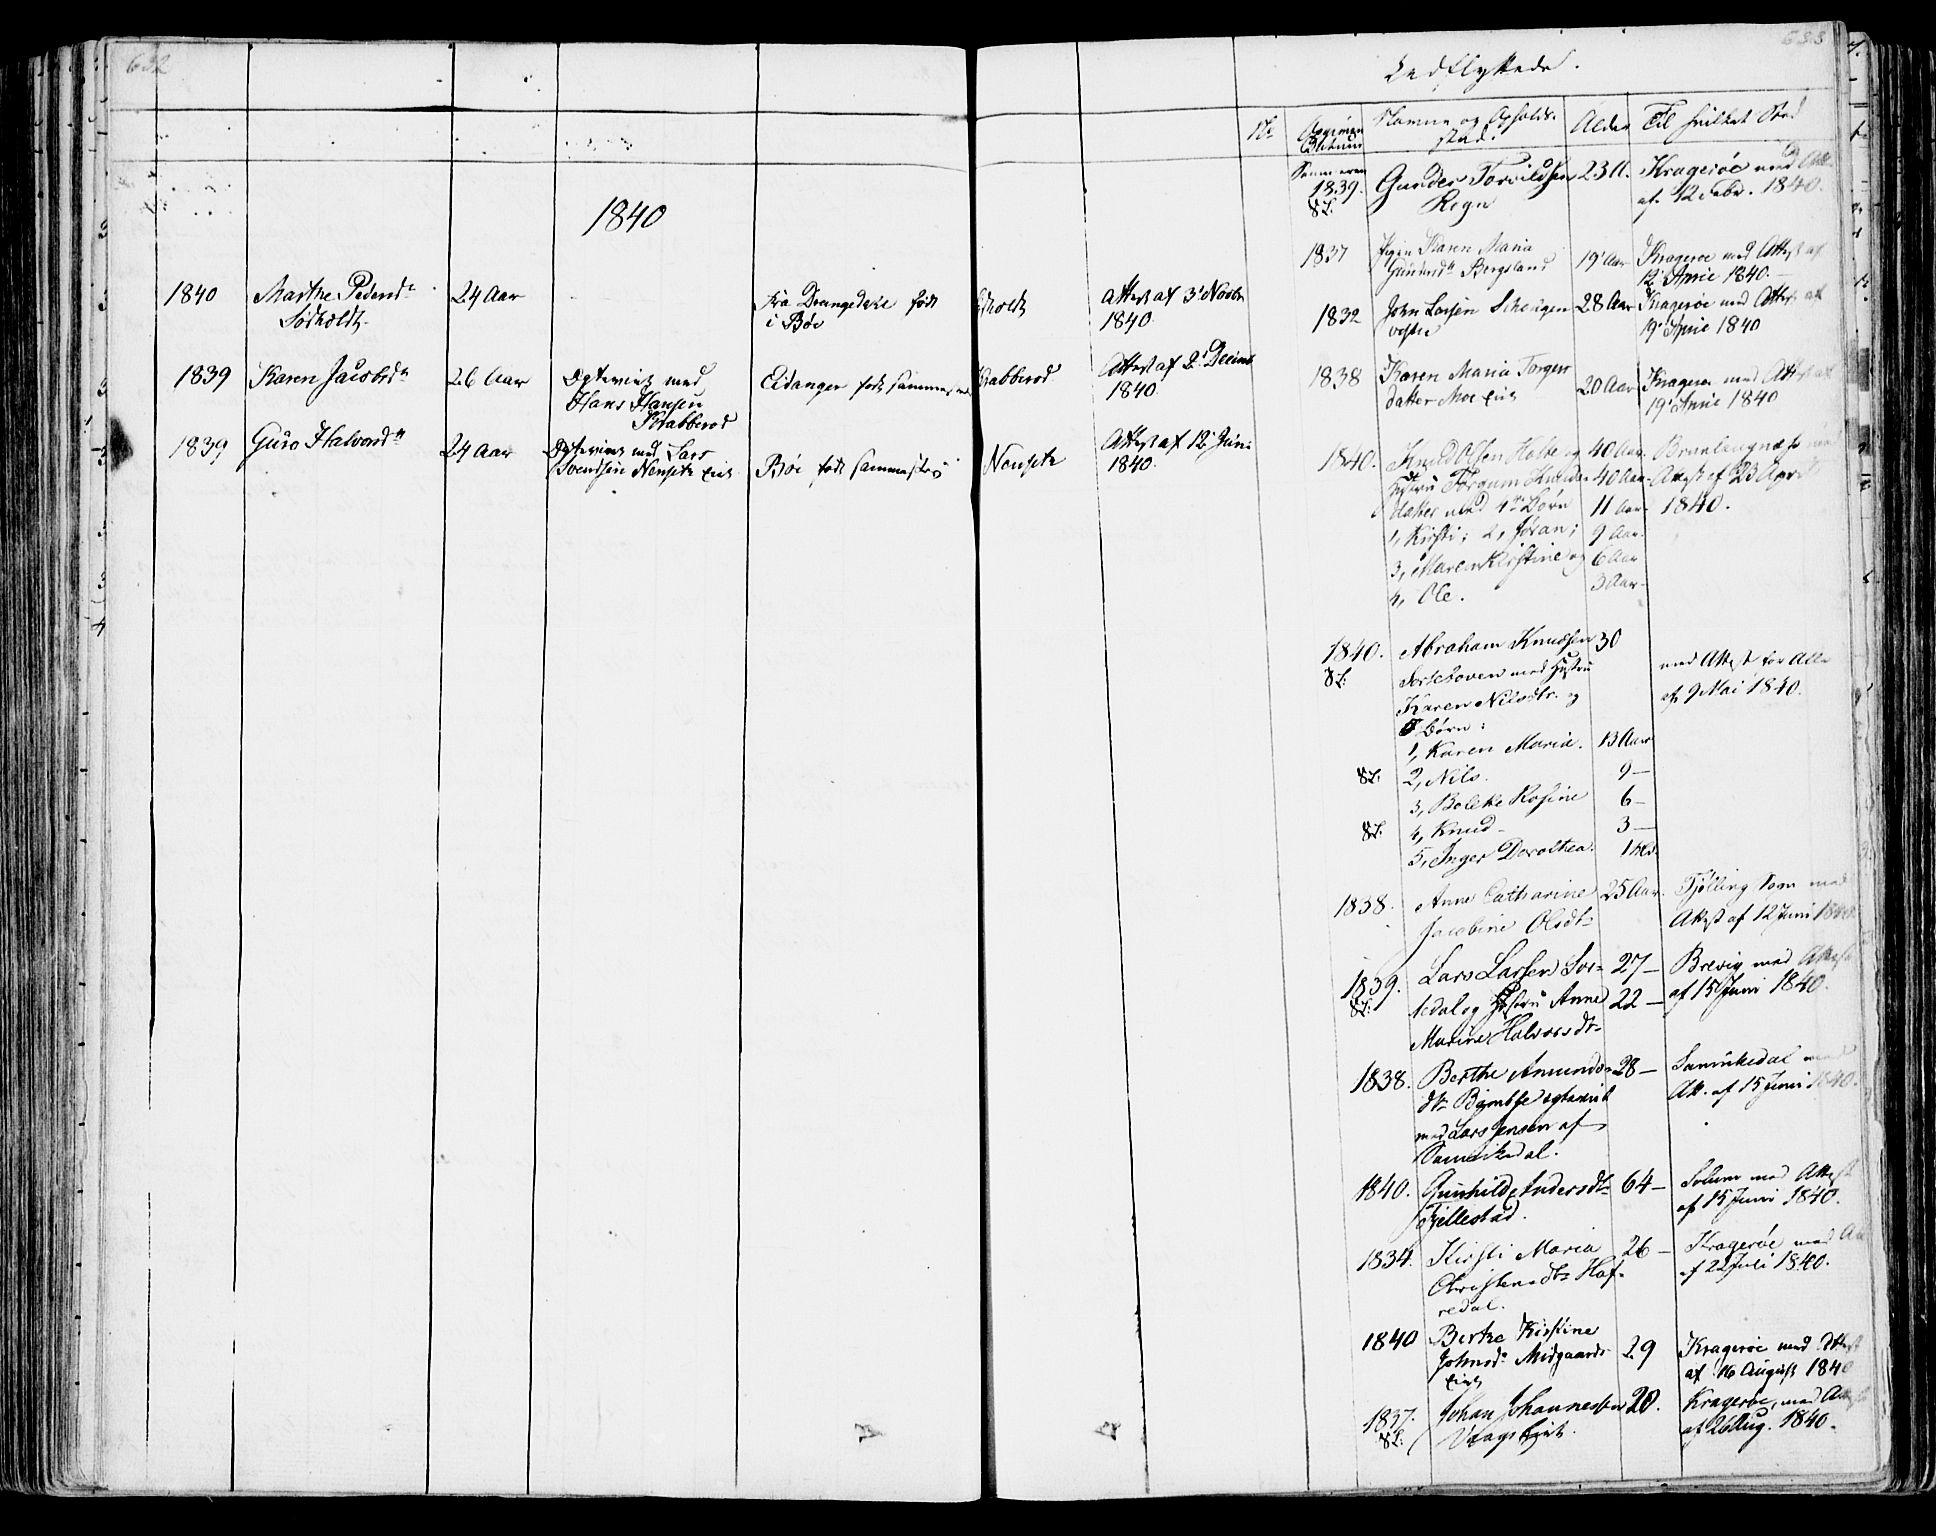 SAKO, Bamble kirkebøker, F/Fa/L0004: Ministerialbok nr. I 4, 1834-1853, s. 632-633